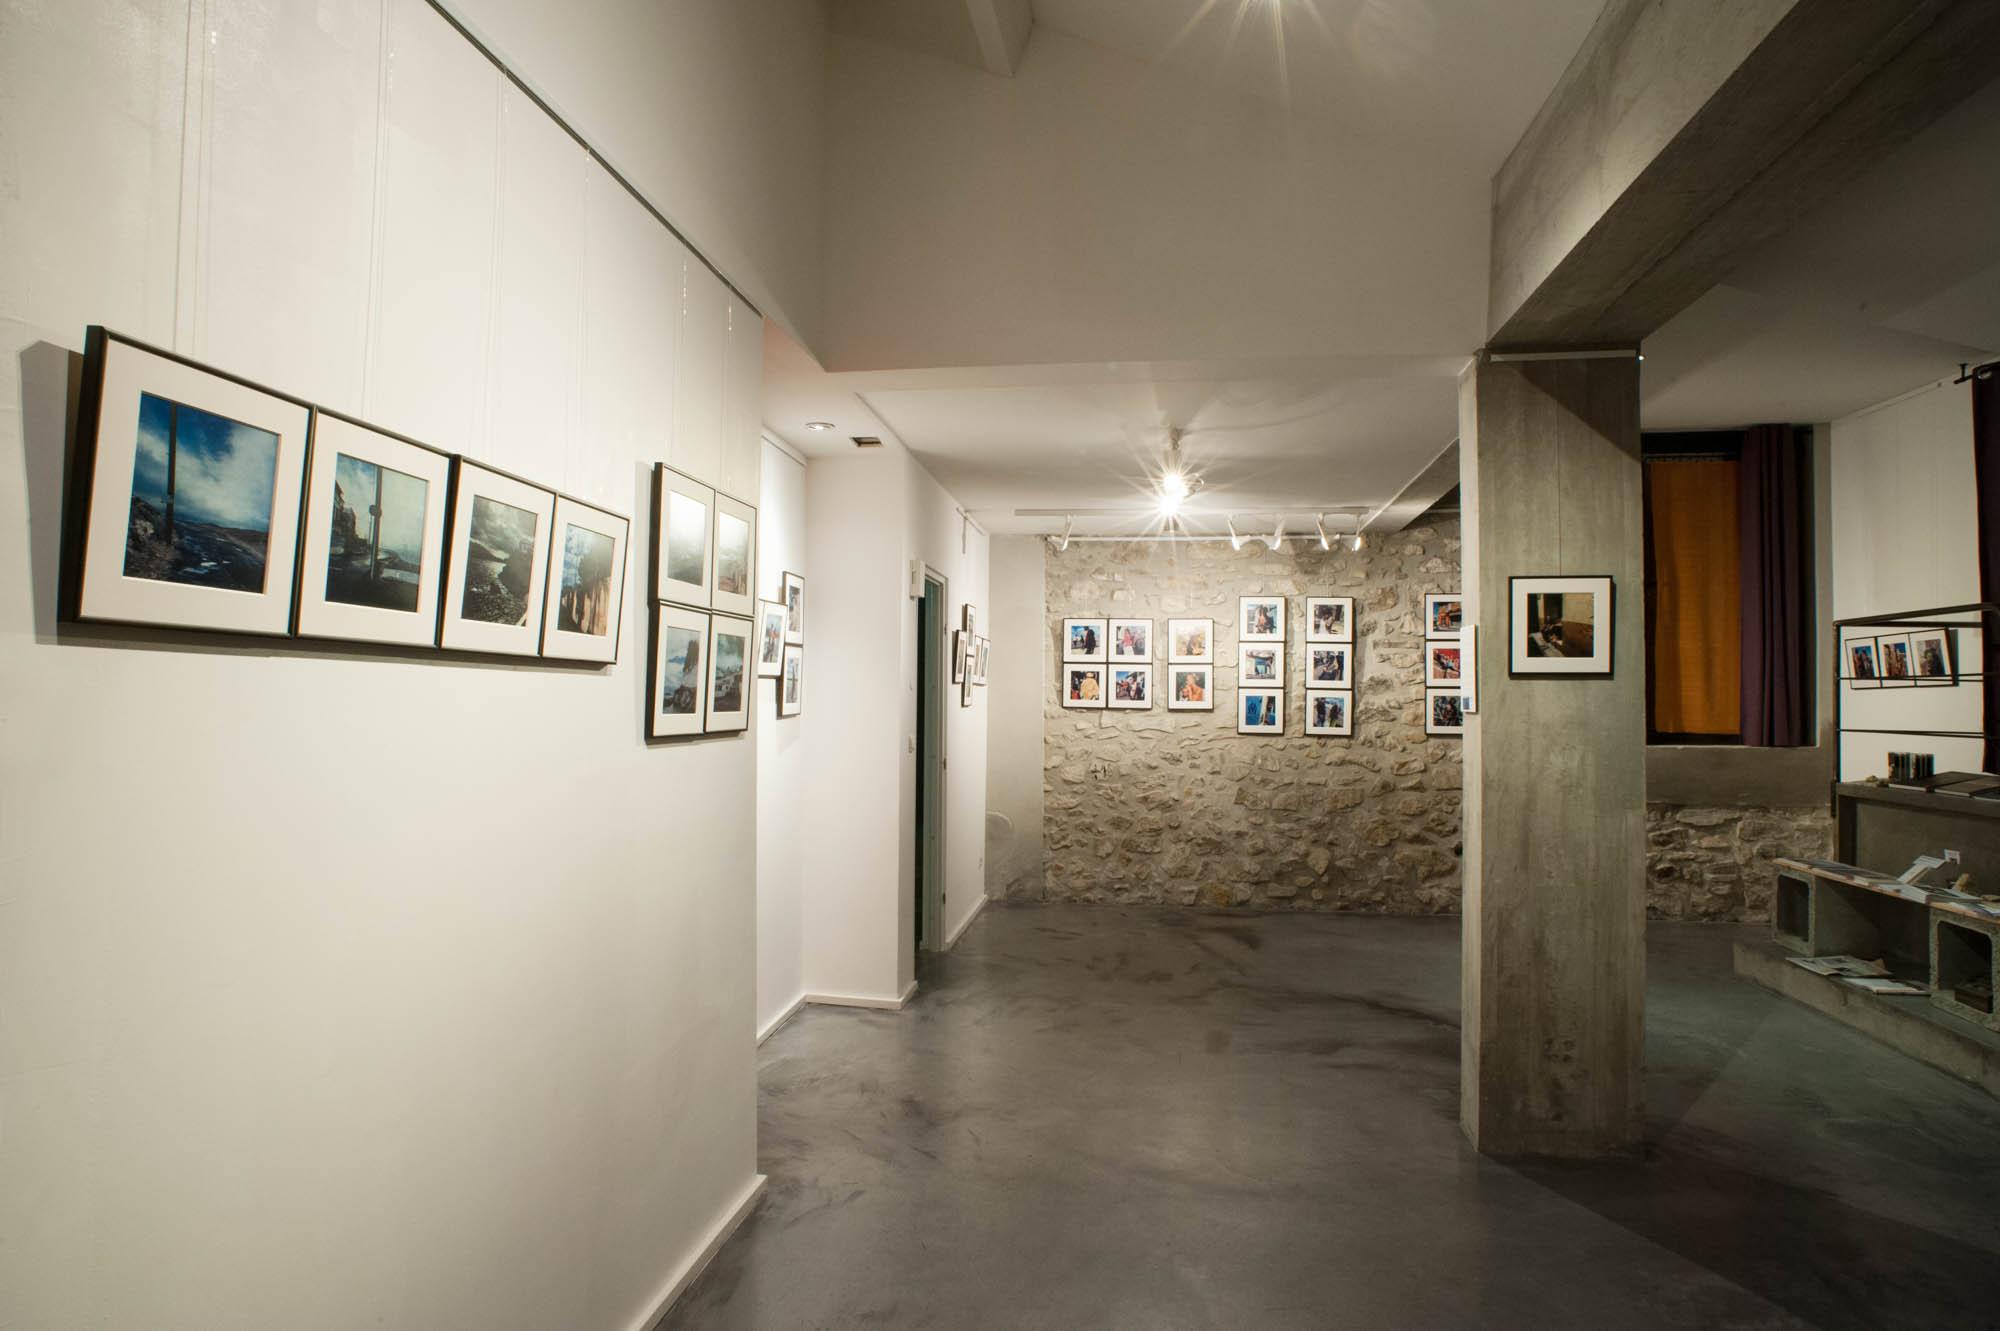 Formations et stages photo à Marseille au Garage Photographie avec William Guidarini